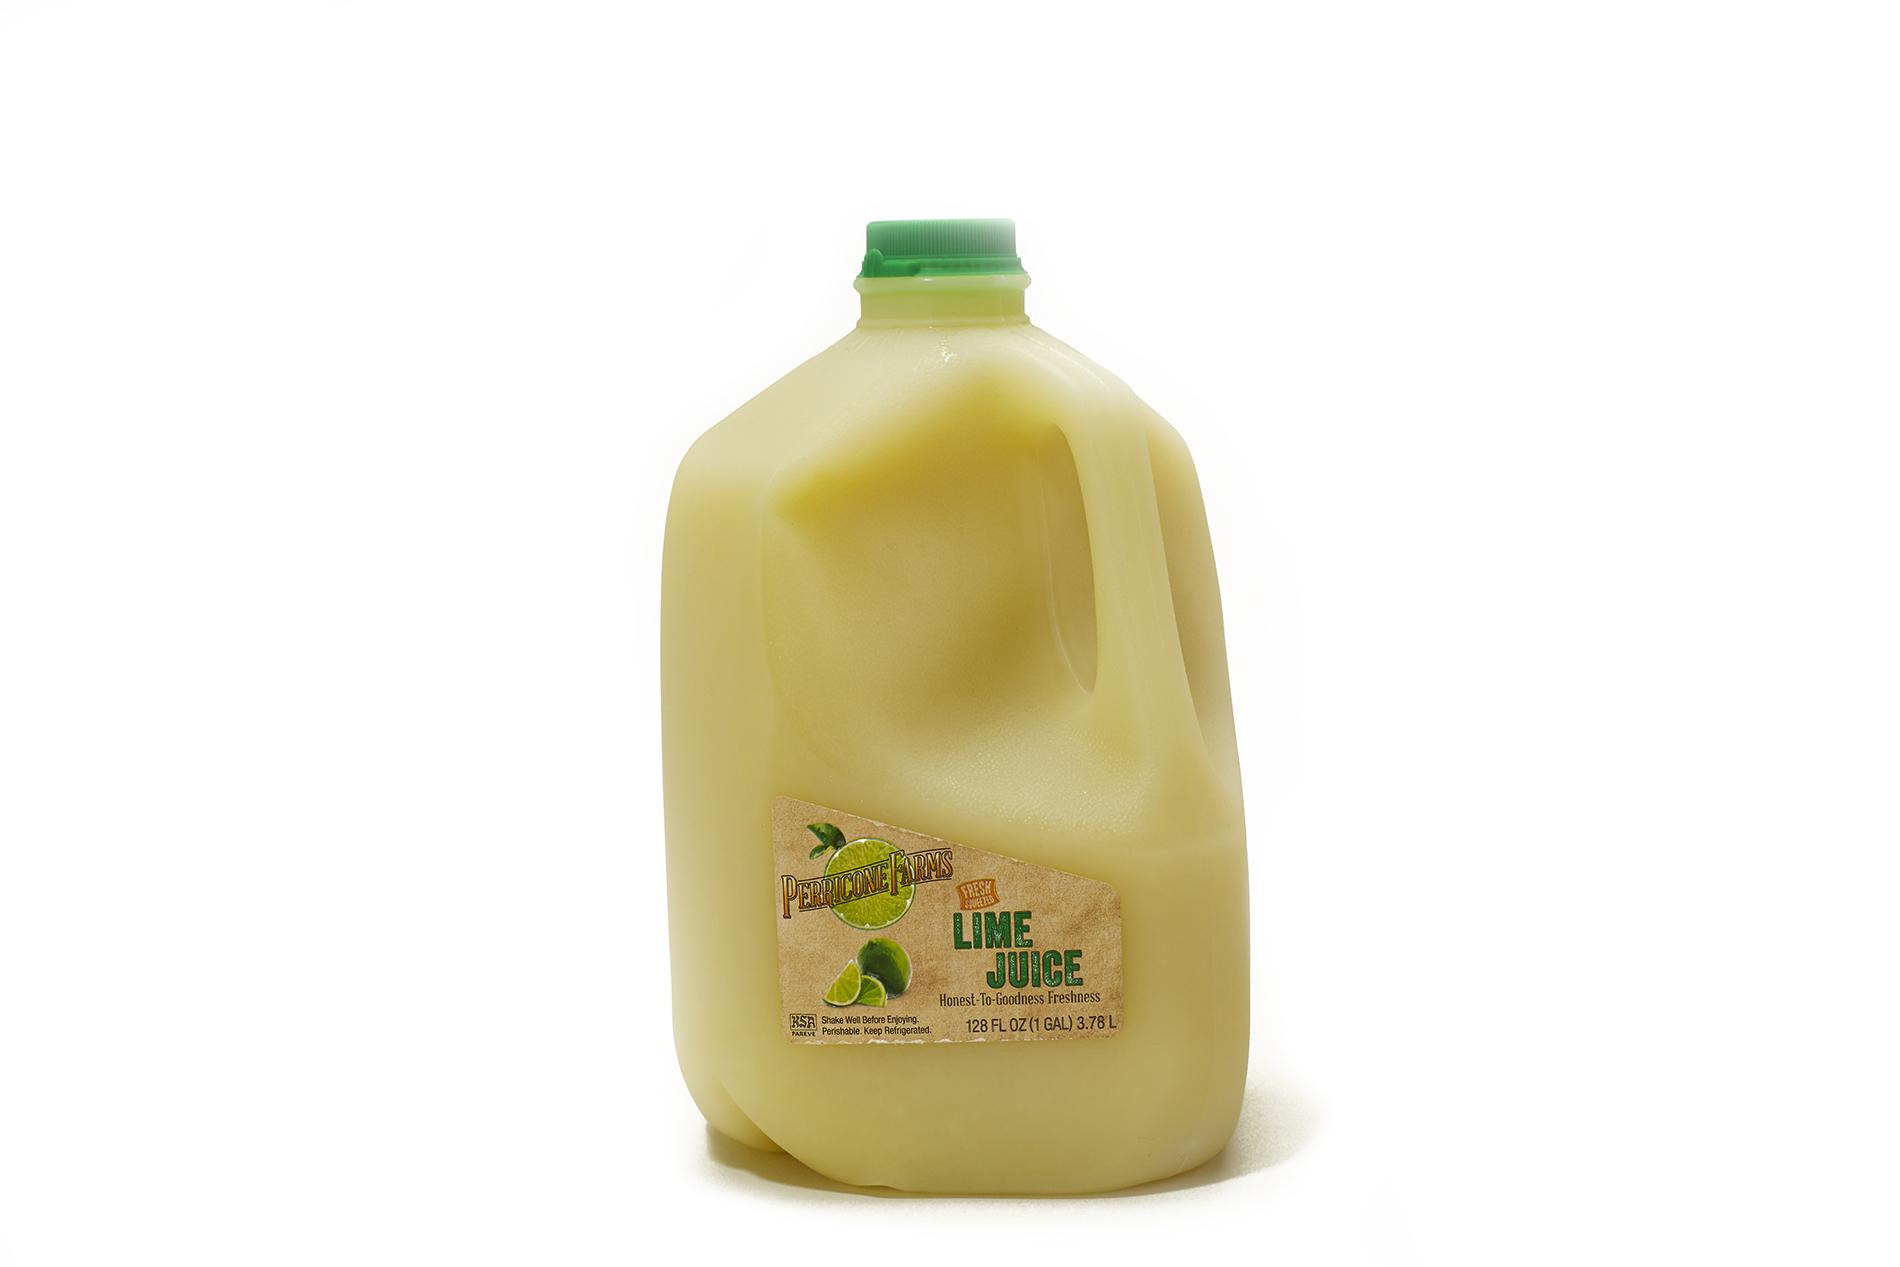 Gallon jug of fresh lime juice